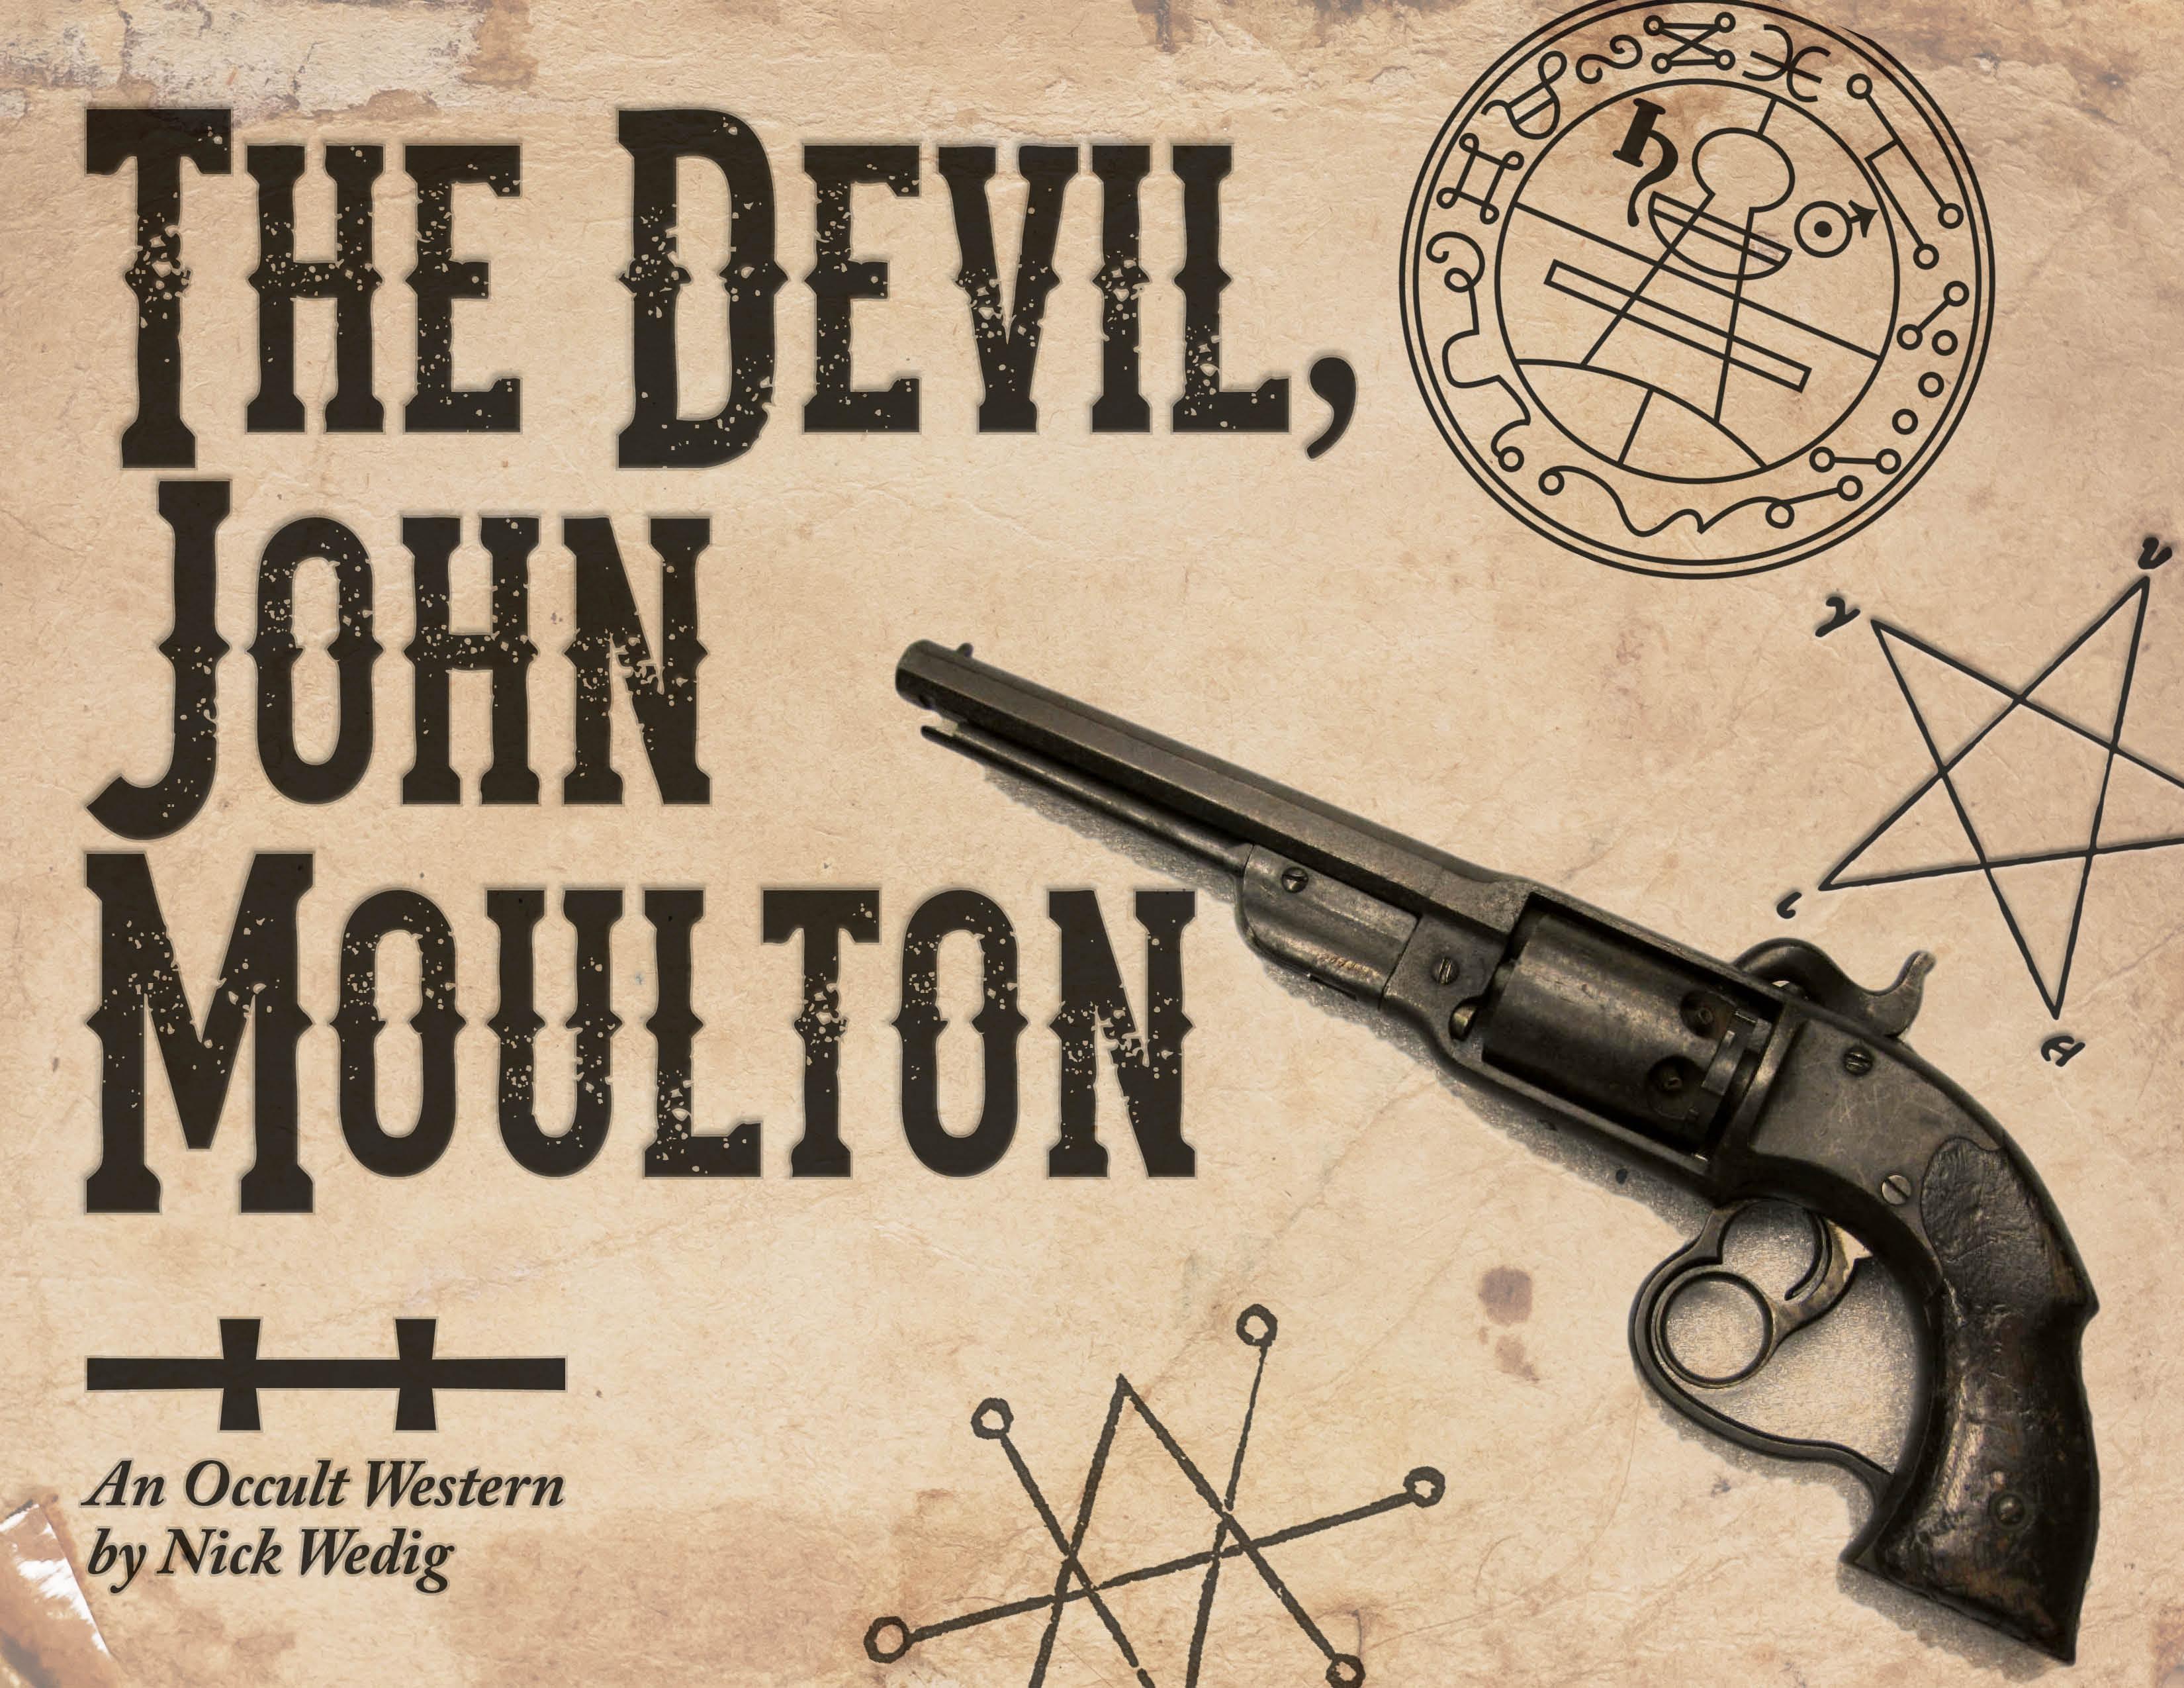 devil john